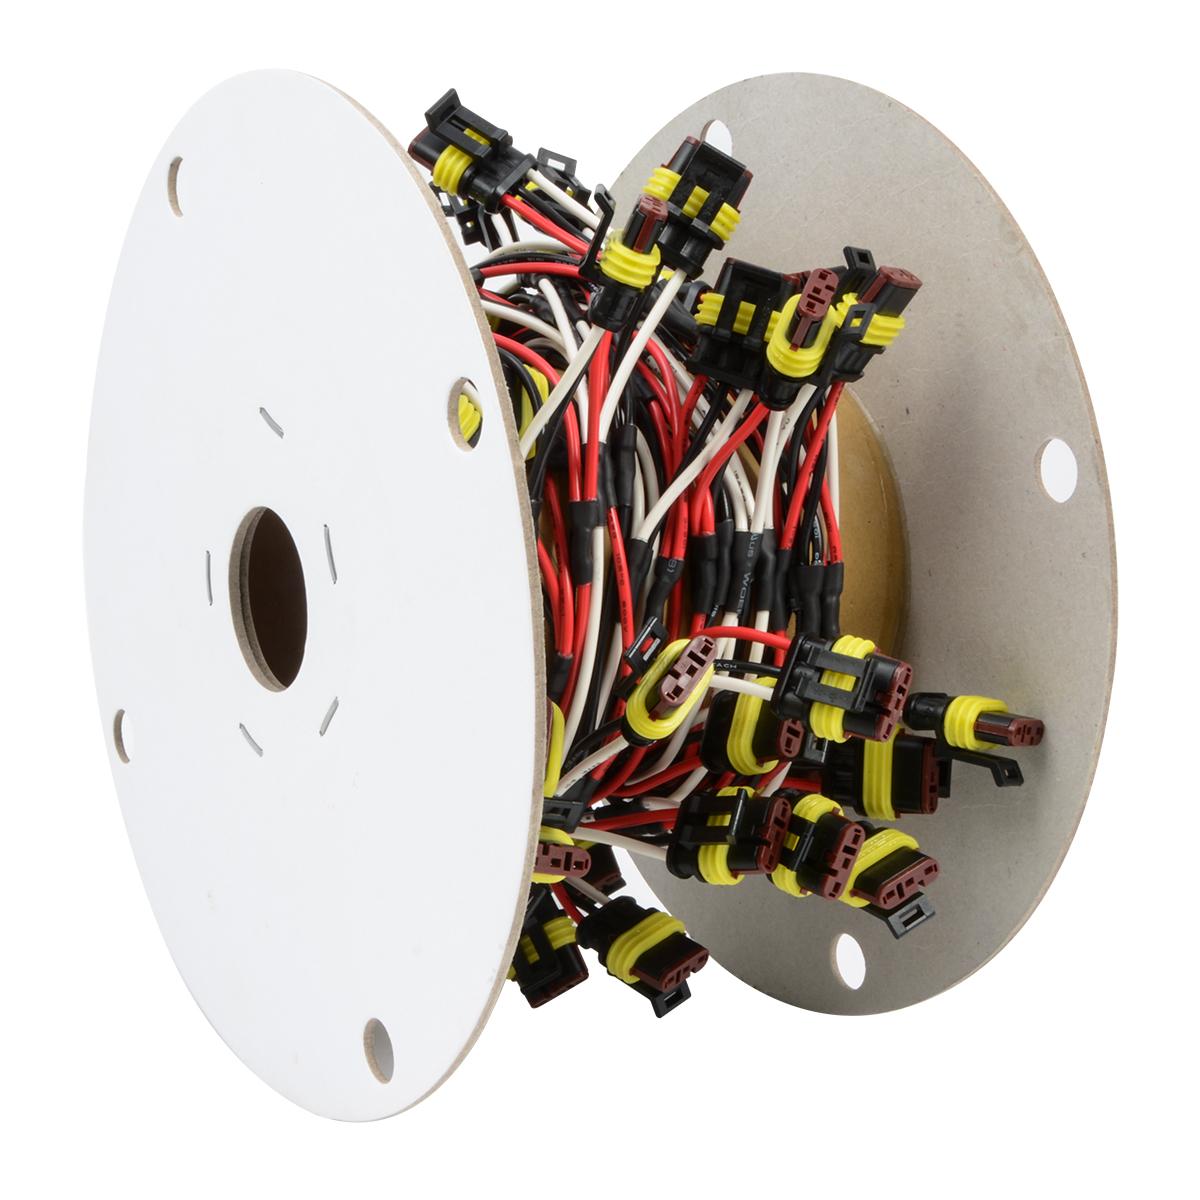 88097.MAIN_?fit=1200%2C1200&ssl=1 continuous 3 pin light plug wire harness roll grand general auto